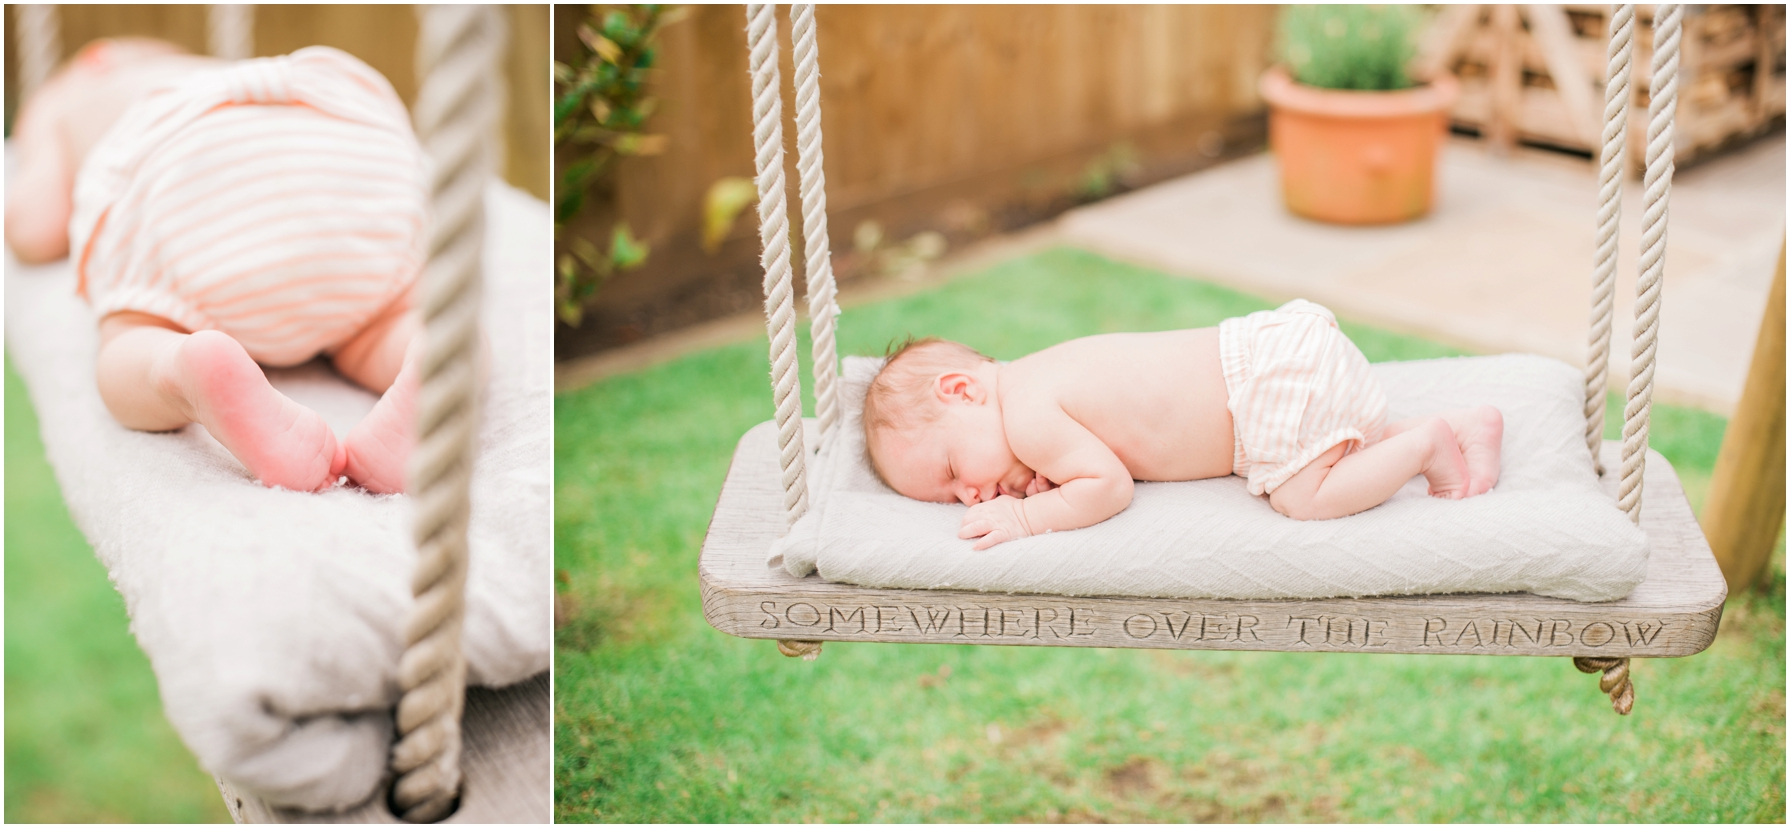 a newborn baby sleeping on a wooden swing